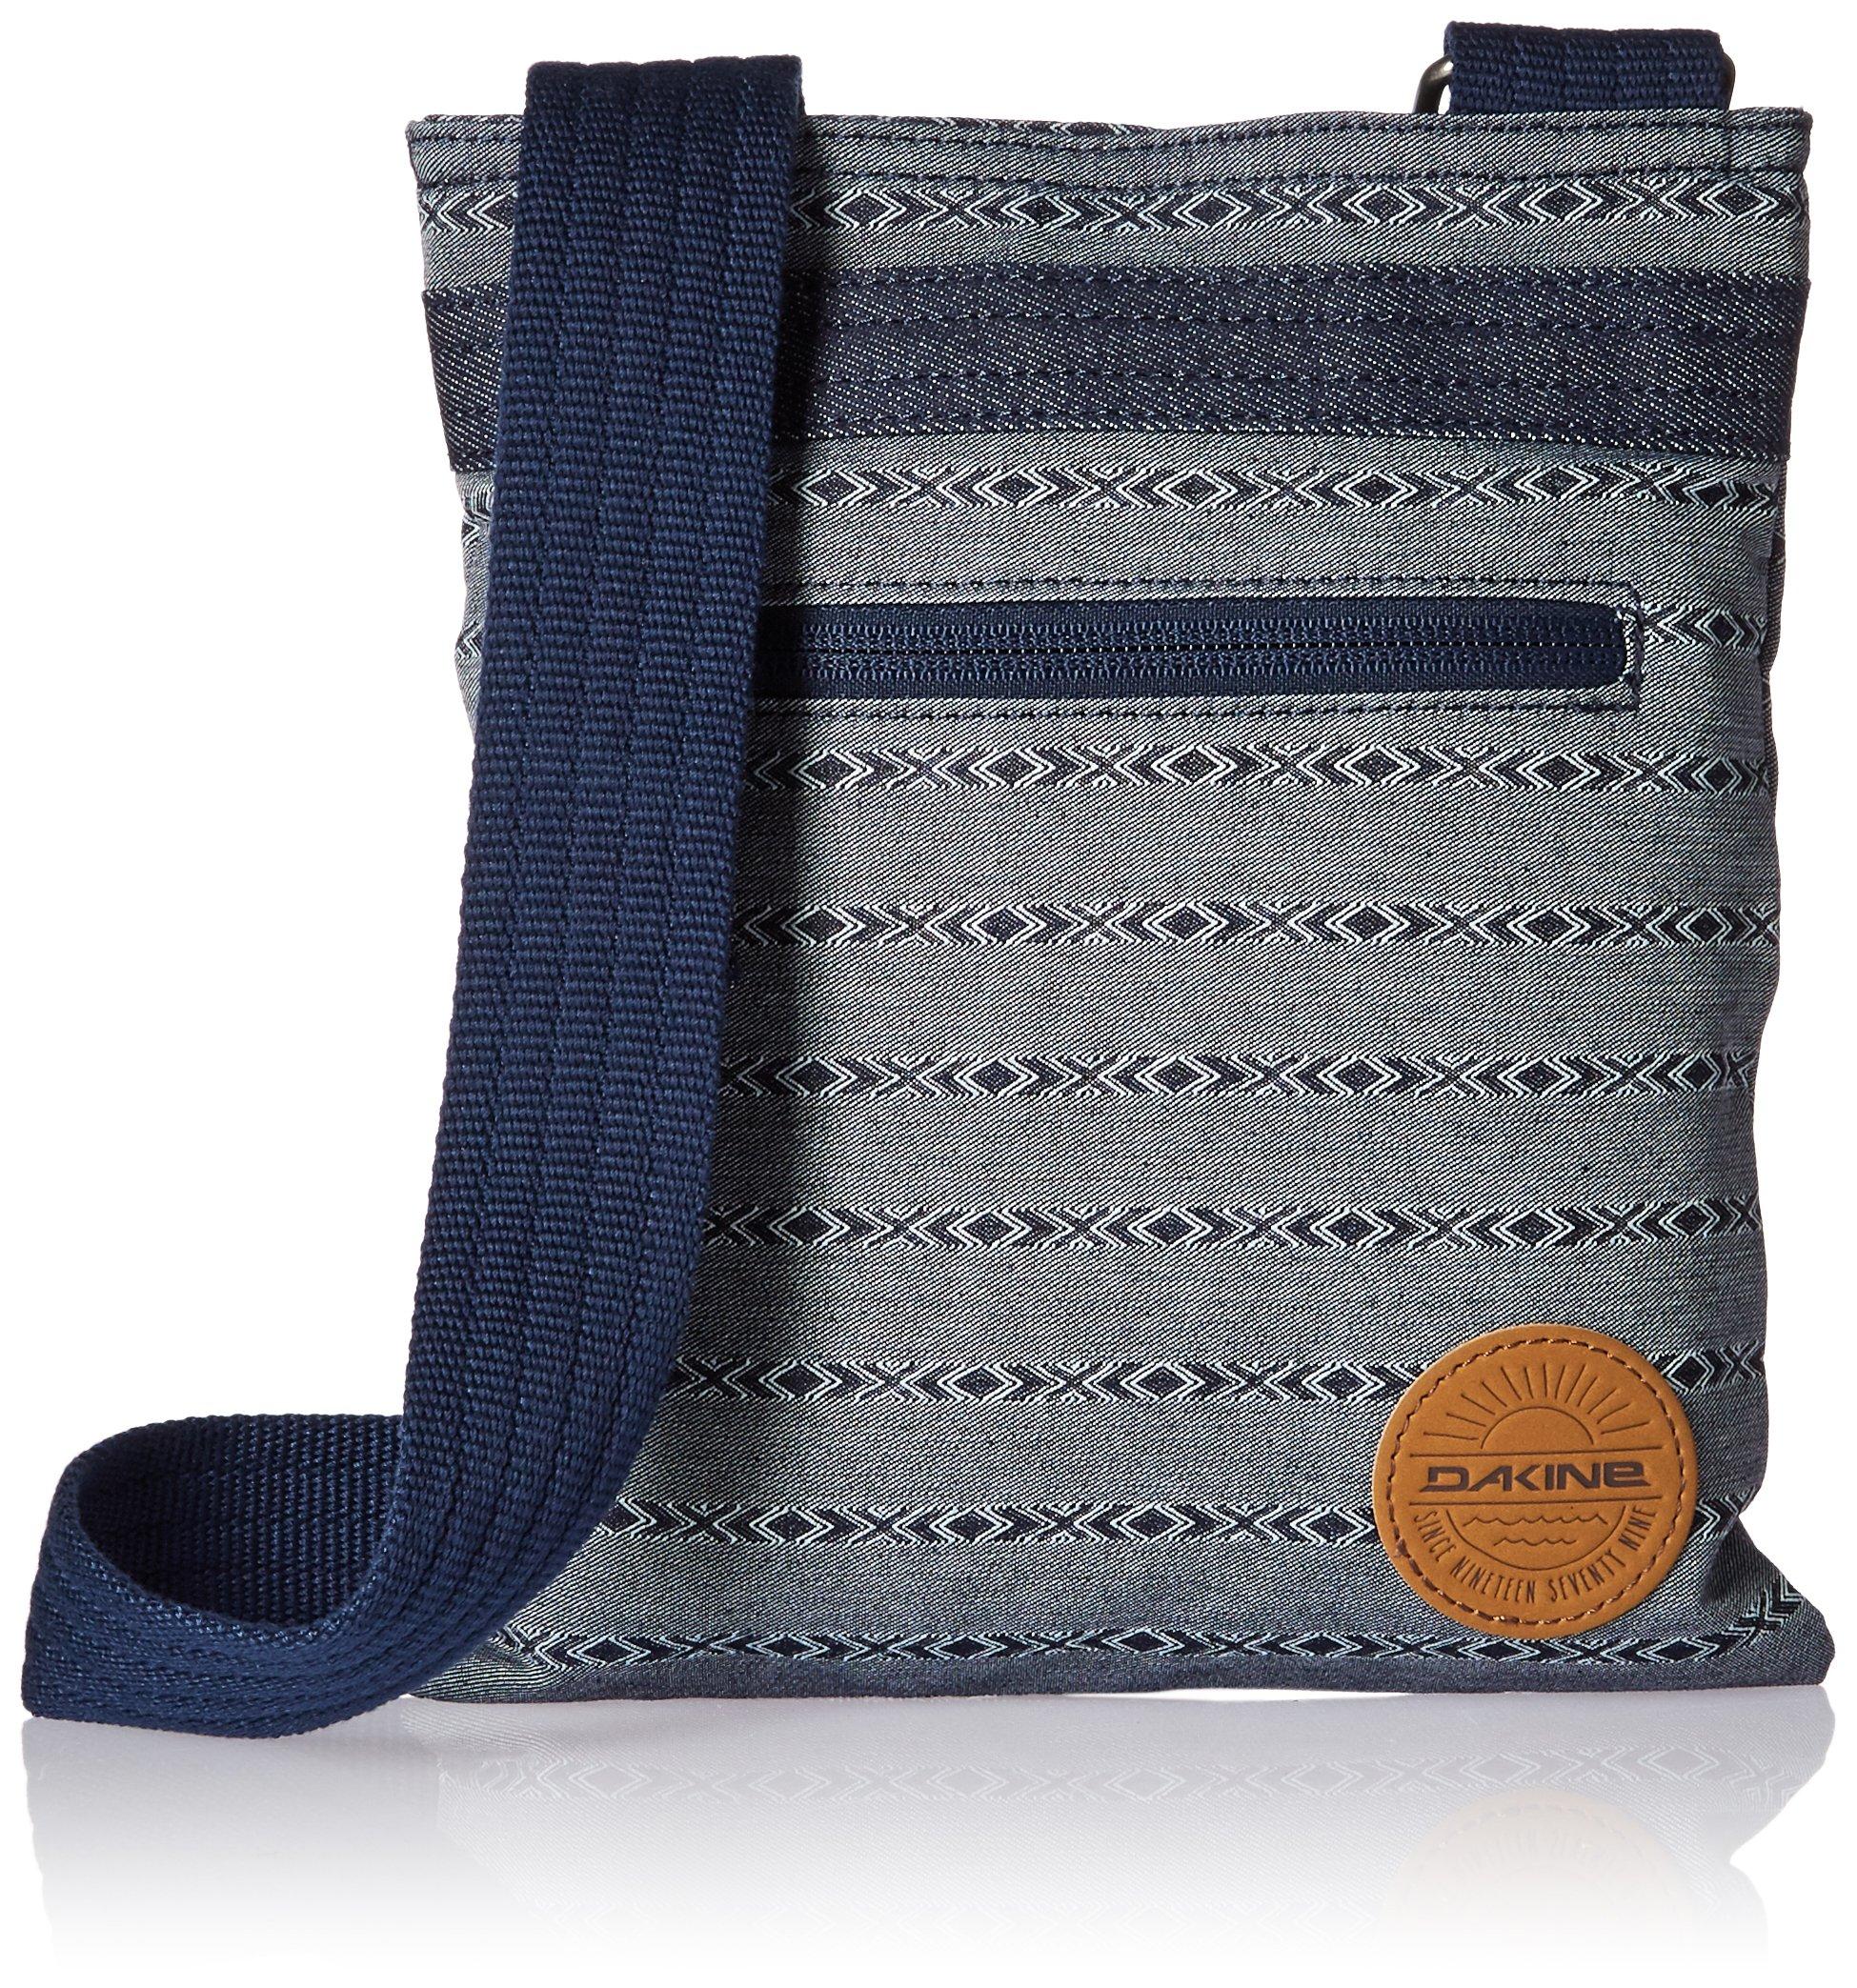 Dakine 10001220 610934174854 Jive Canvas Crossbody Bag, Bonnie, One Size